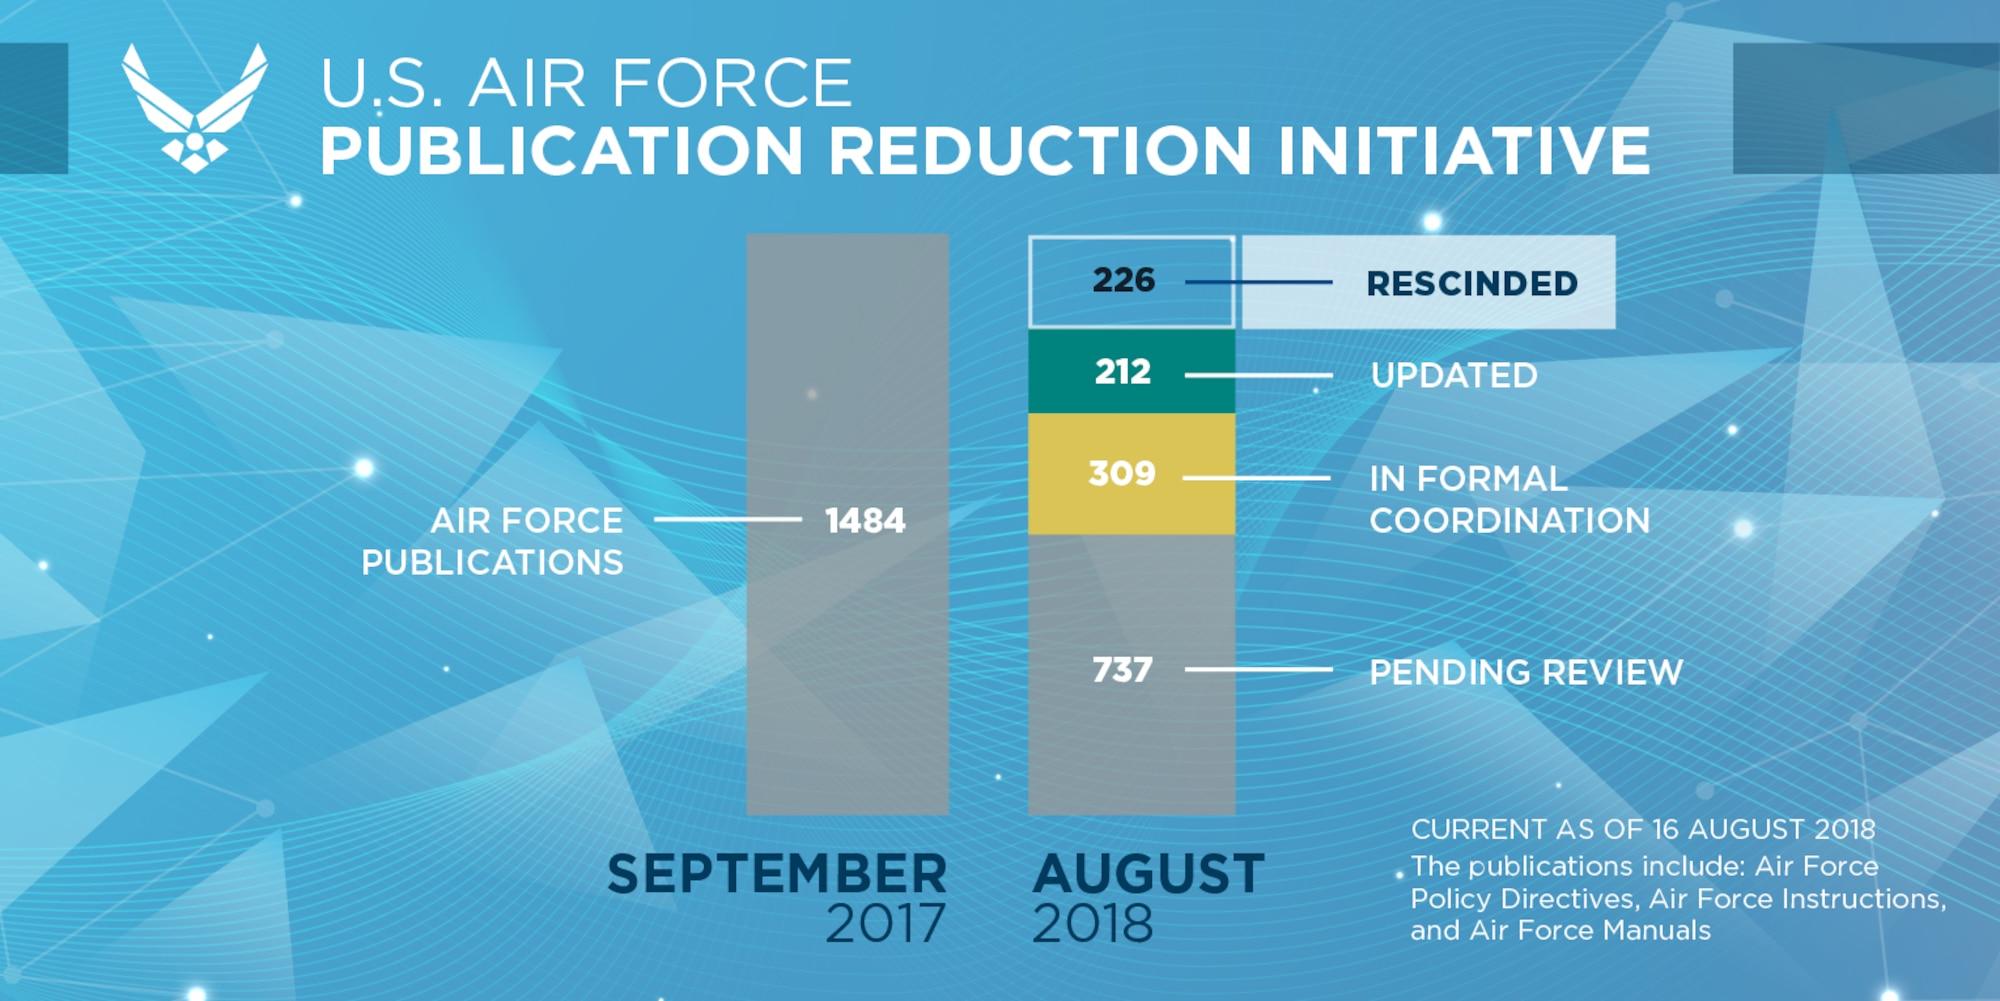 USAF Publication Reduction Initiative